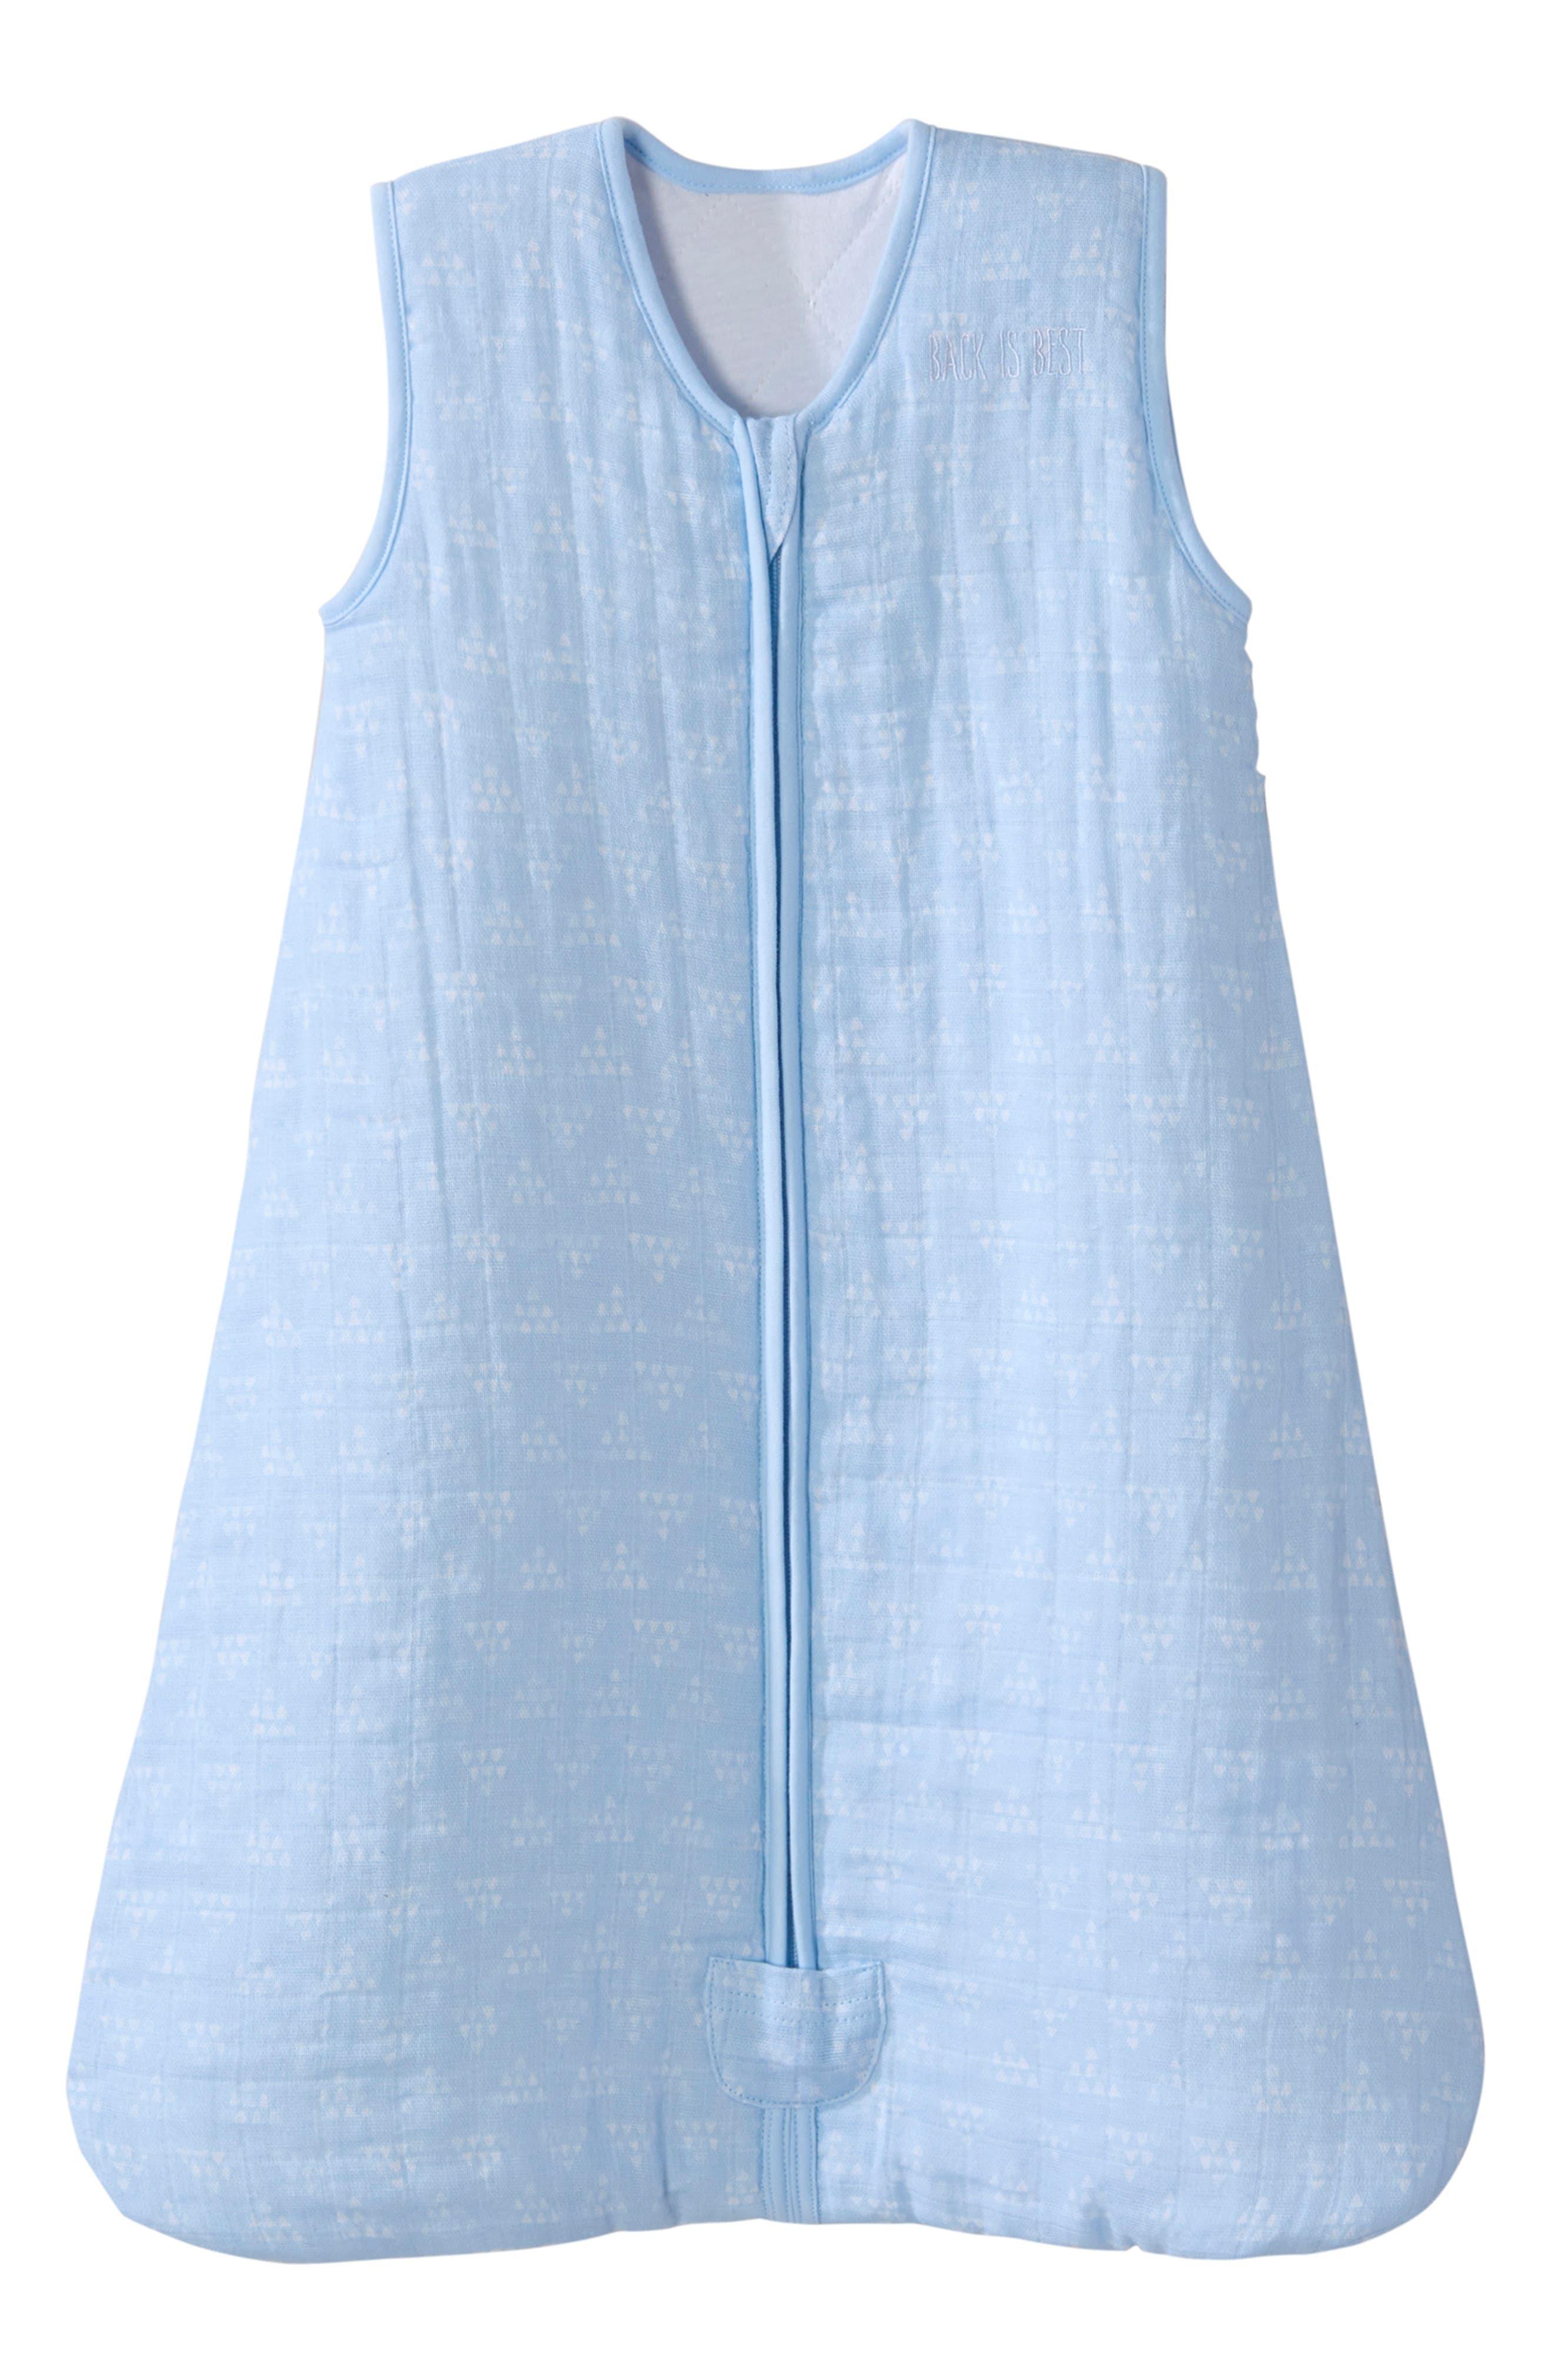 Halo Platinum Series Sleepsack(TM) Quilted Muslin Wearable Blanket Size 612M  Blue